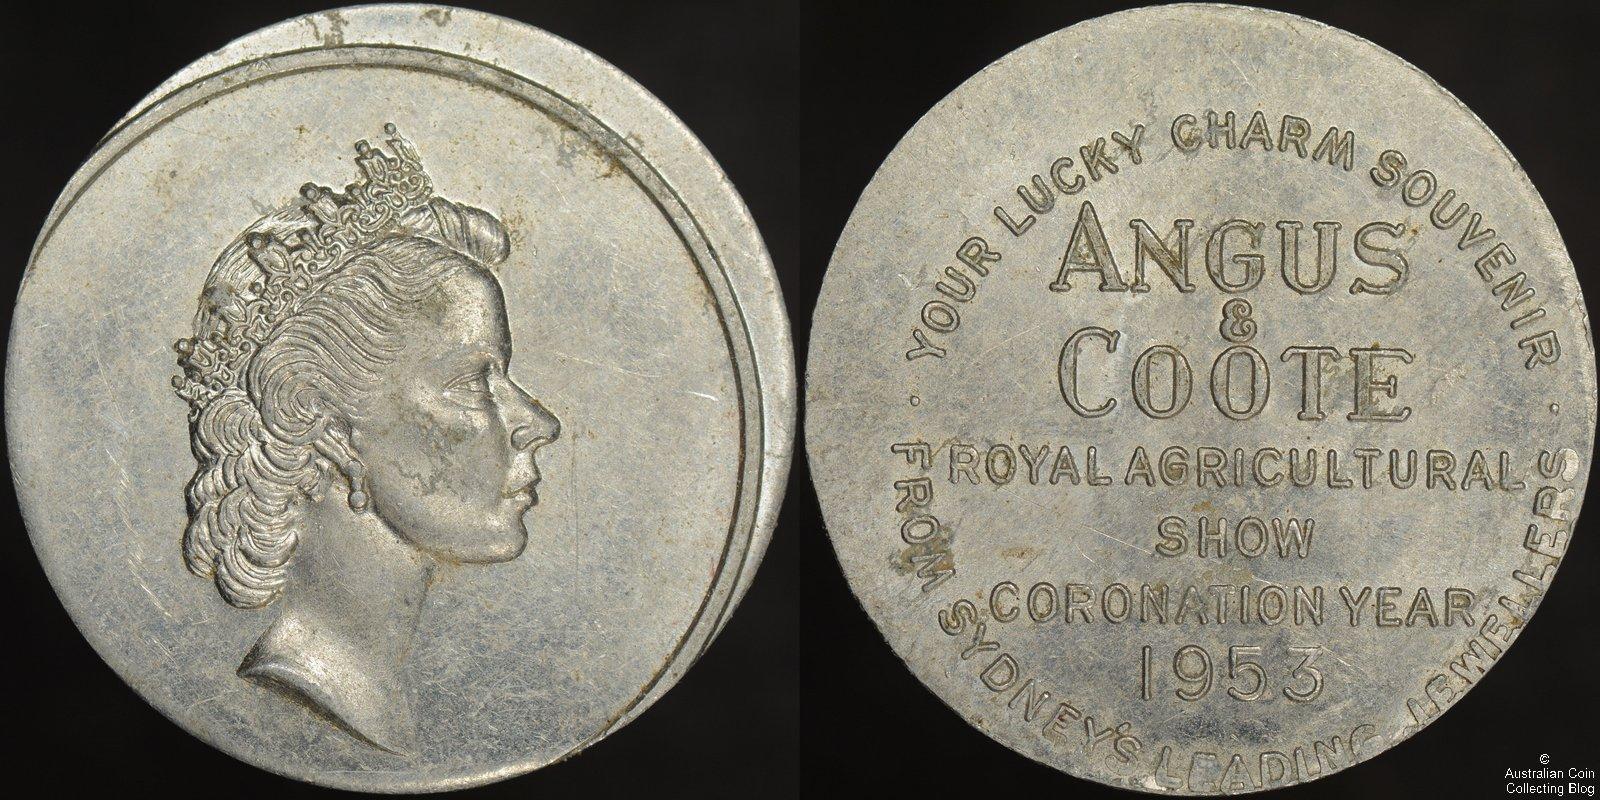 Australia 1953 Angus and Coote Sydney Agricultural Show Souvenir – 3 mm Off Centre Error